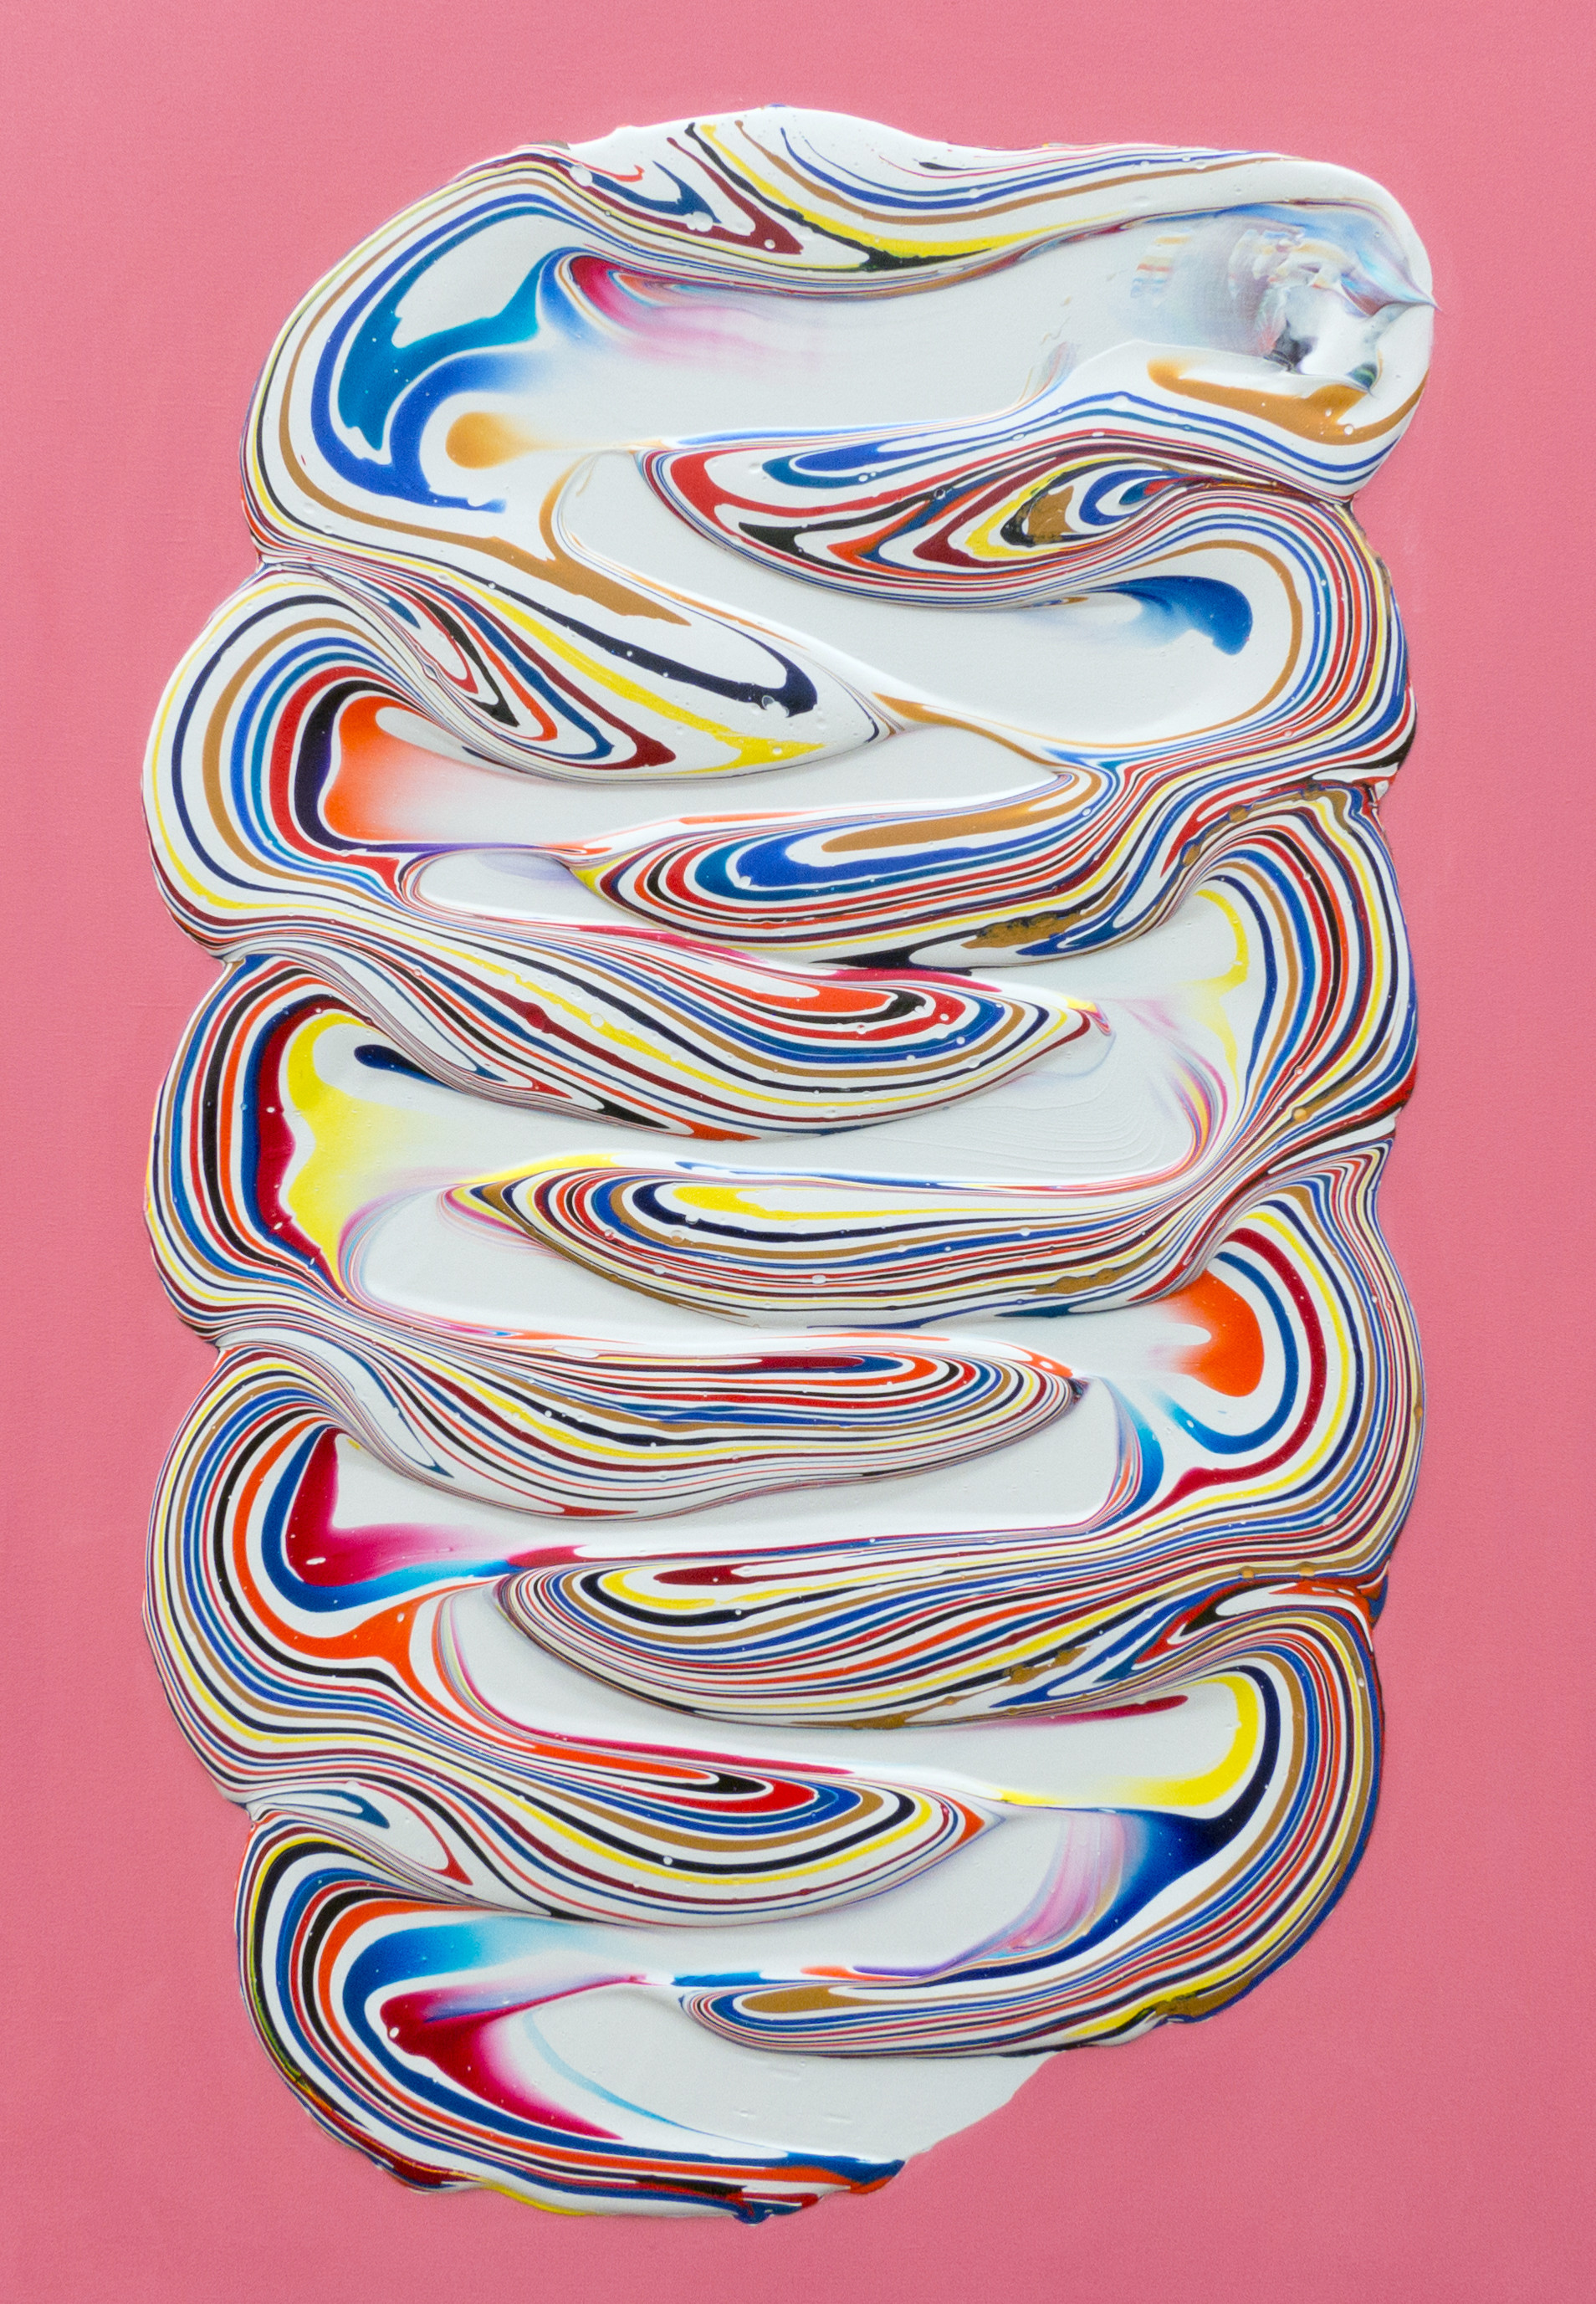 On Pink - Acrylic on canvas - 100x70cm